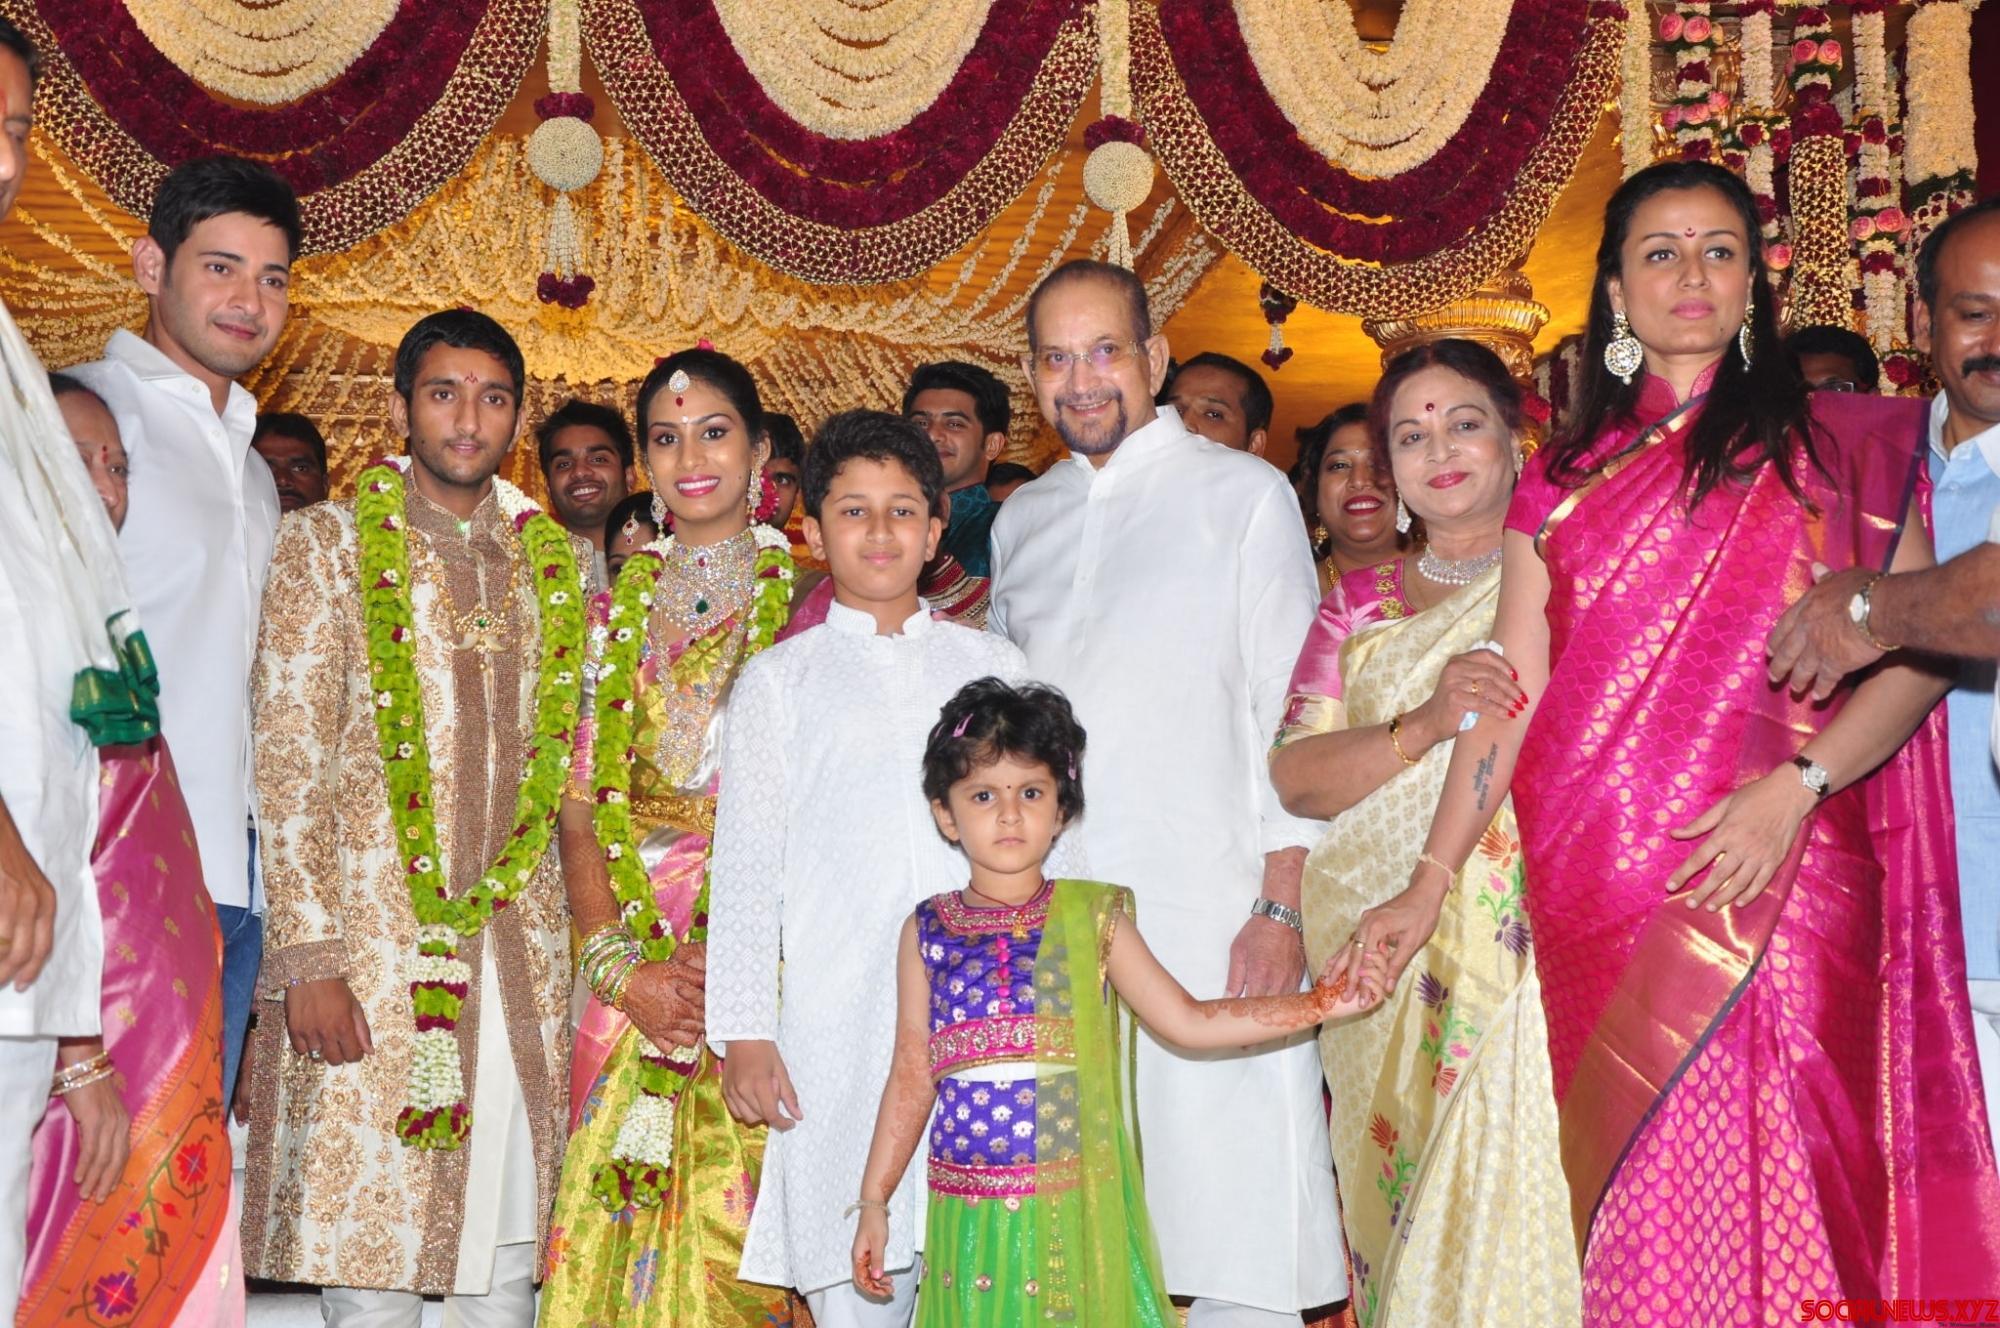 Telangana, Andhrapradesh, India Politics, Movie Reviews Actor sarath babu family photo